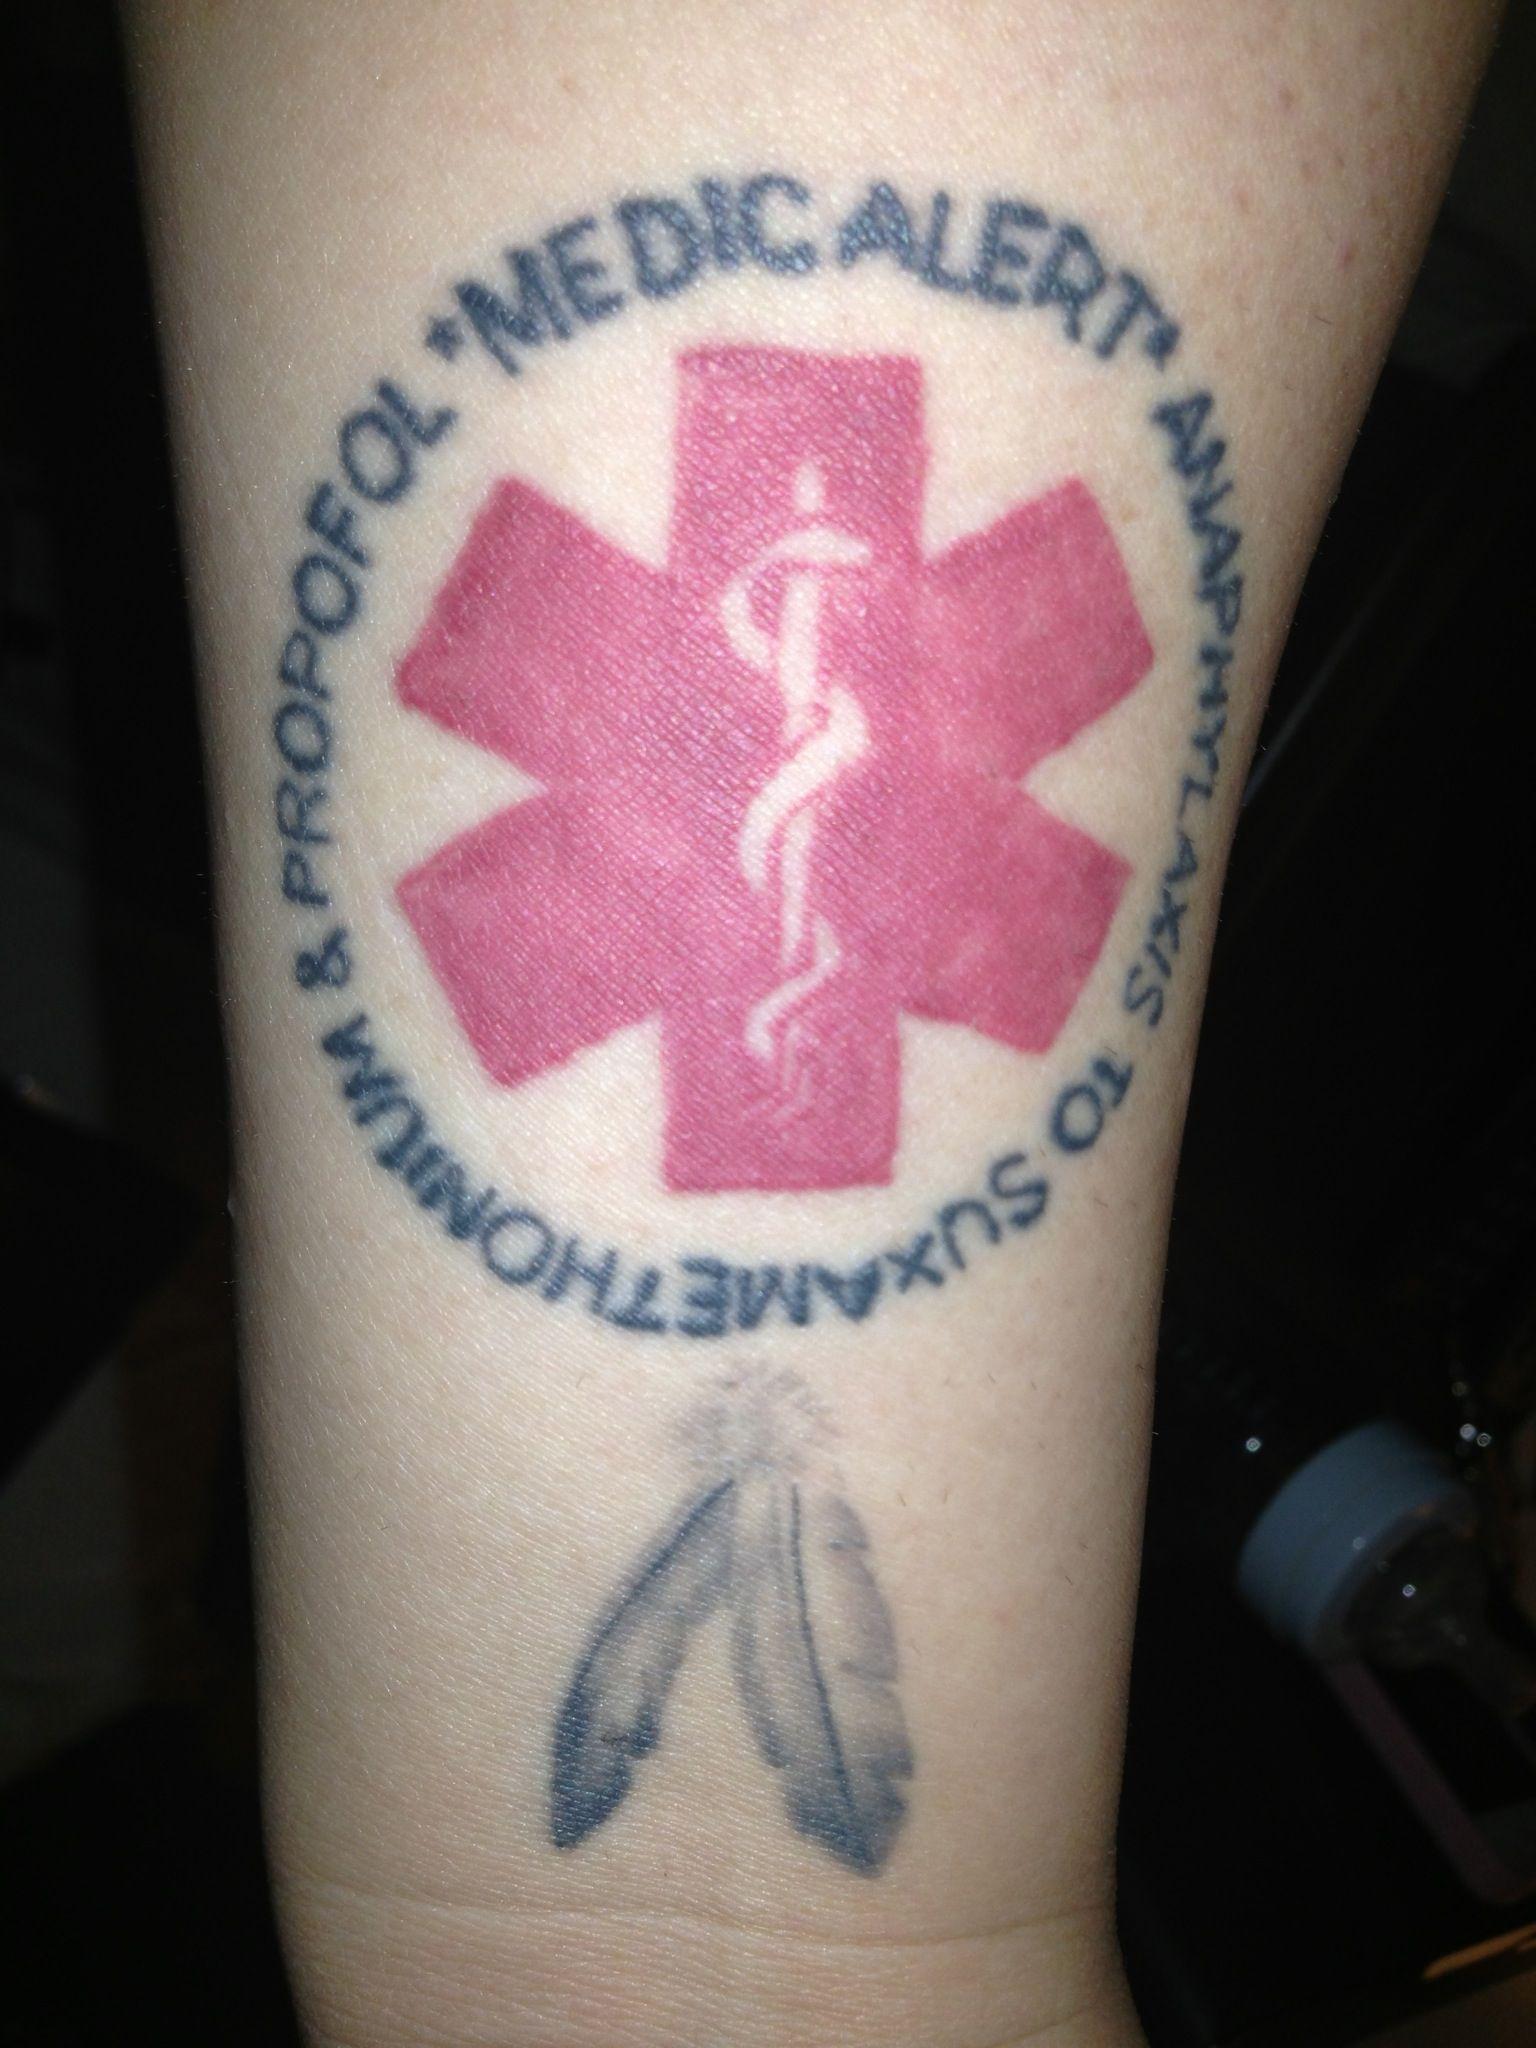 medic alert tattoo forearm